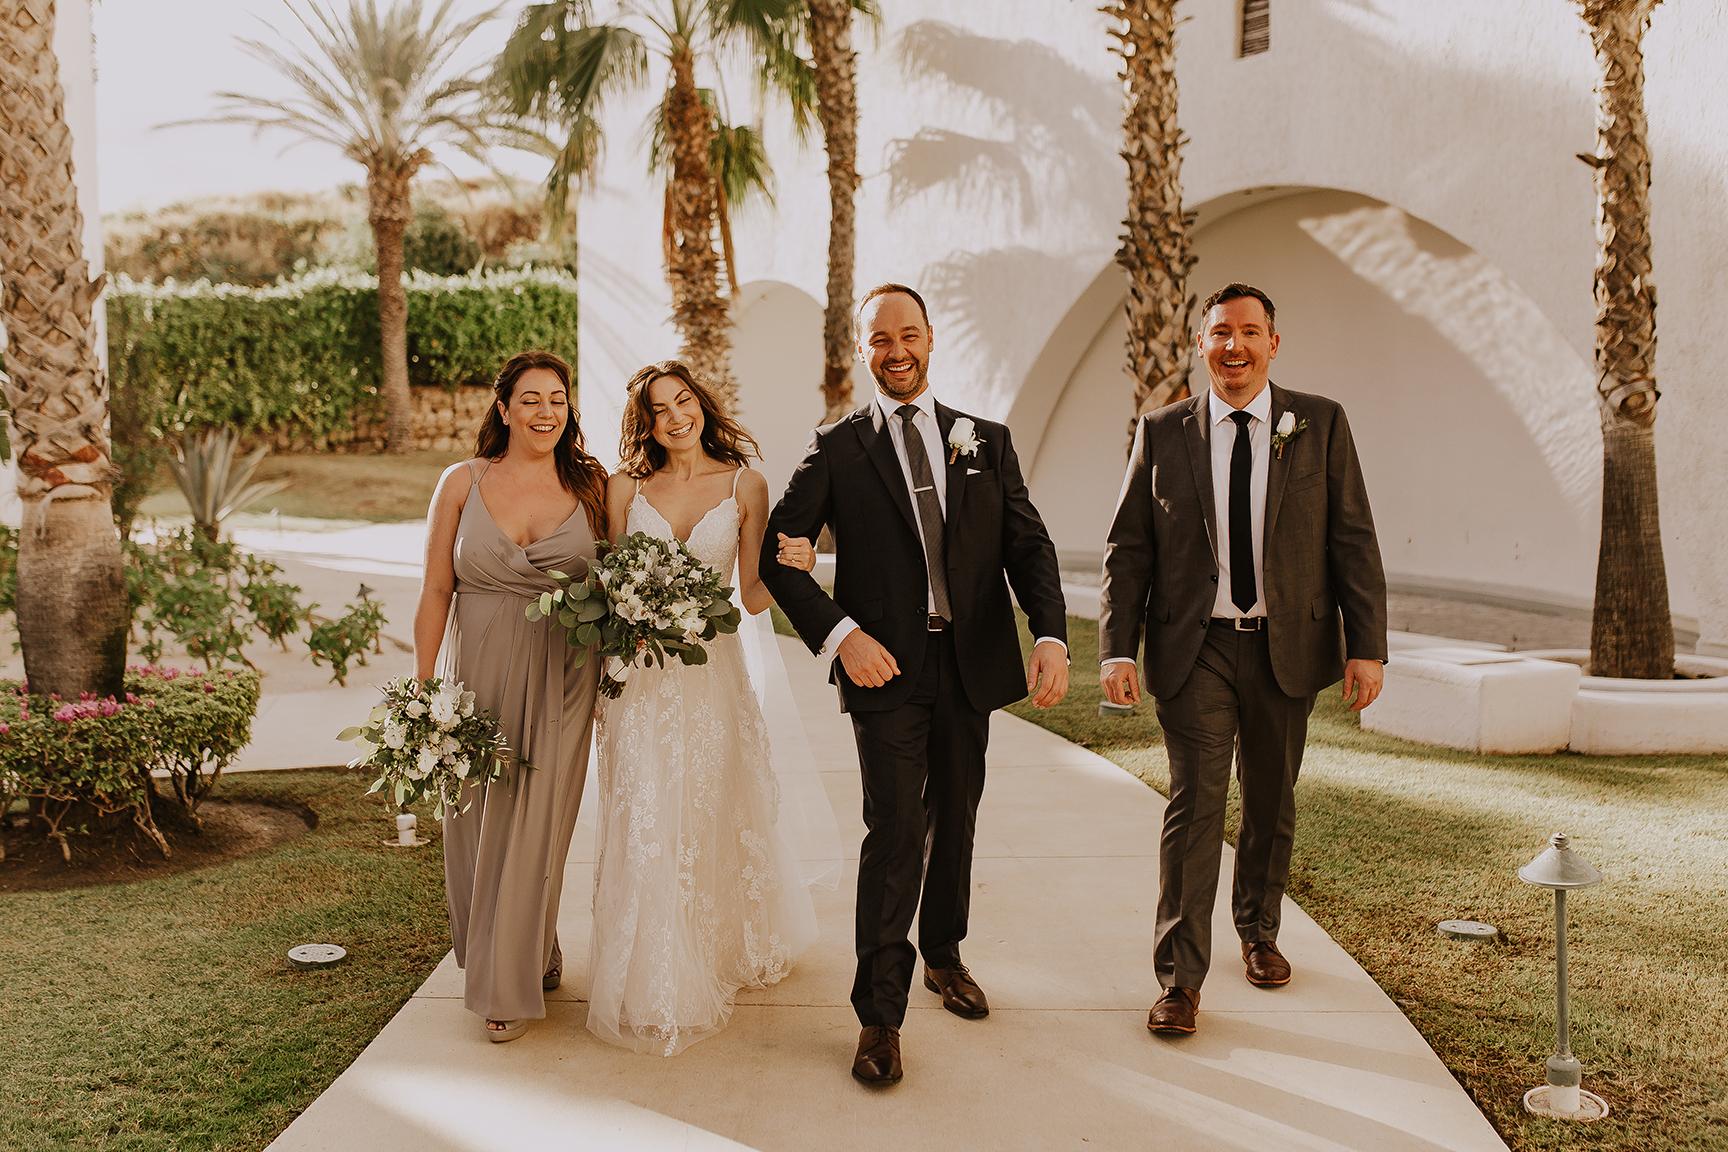 Lindsei+James_cabo_wedding_423.jpg